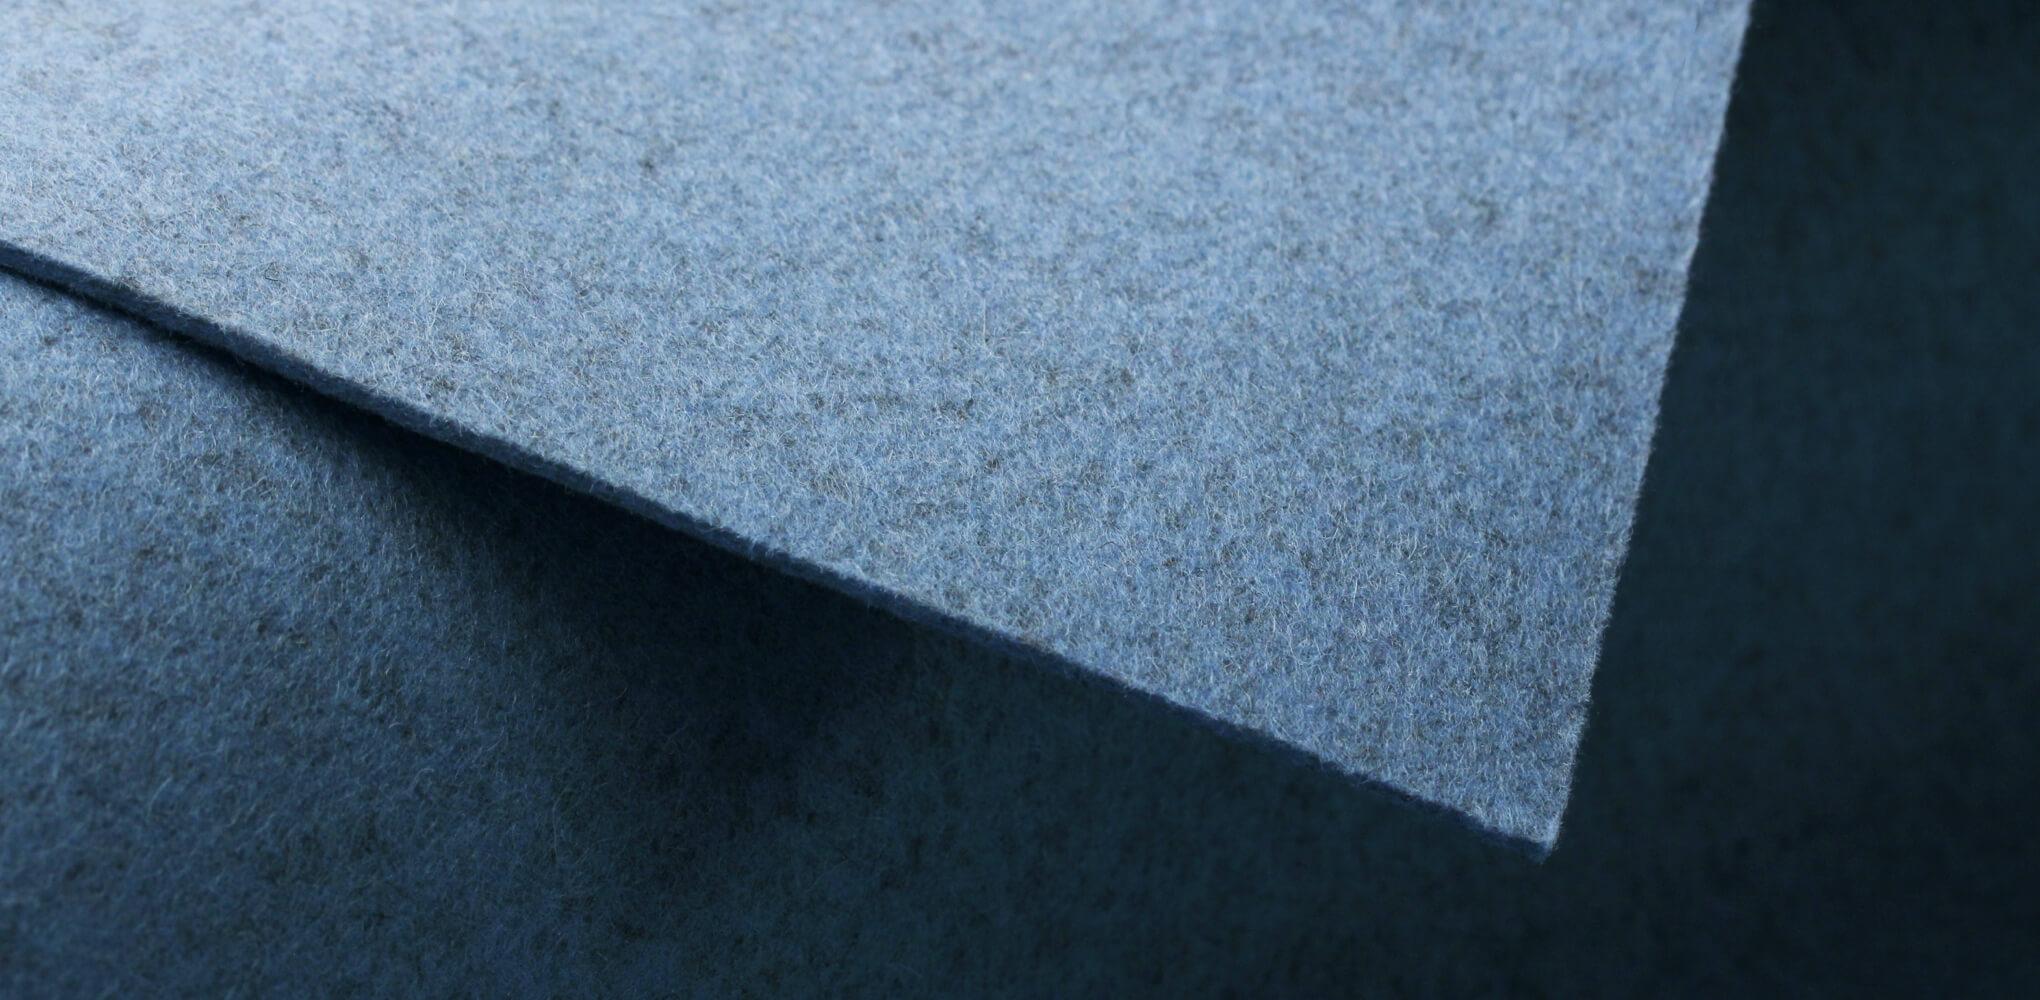 Macro photo of light blue wool felt